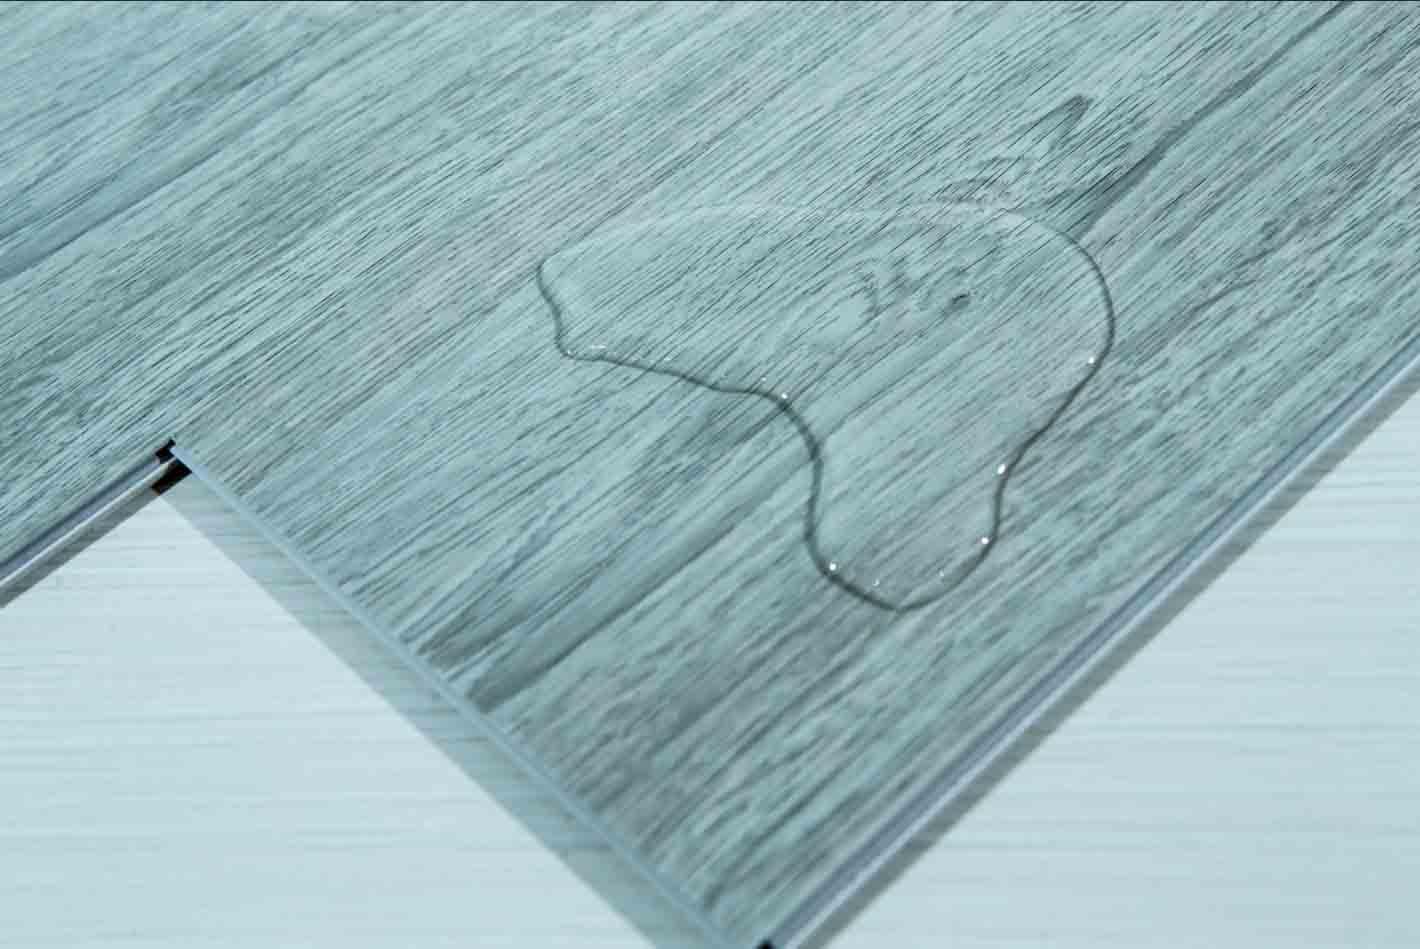 Manufacturer sale vinyl SPC interlocking flooring pvc Lvt floor tiles with cost price